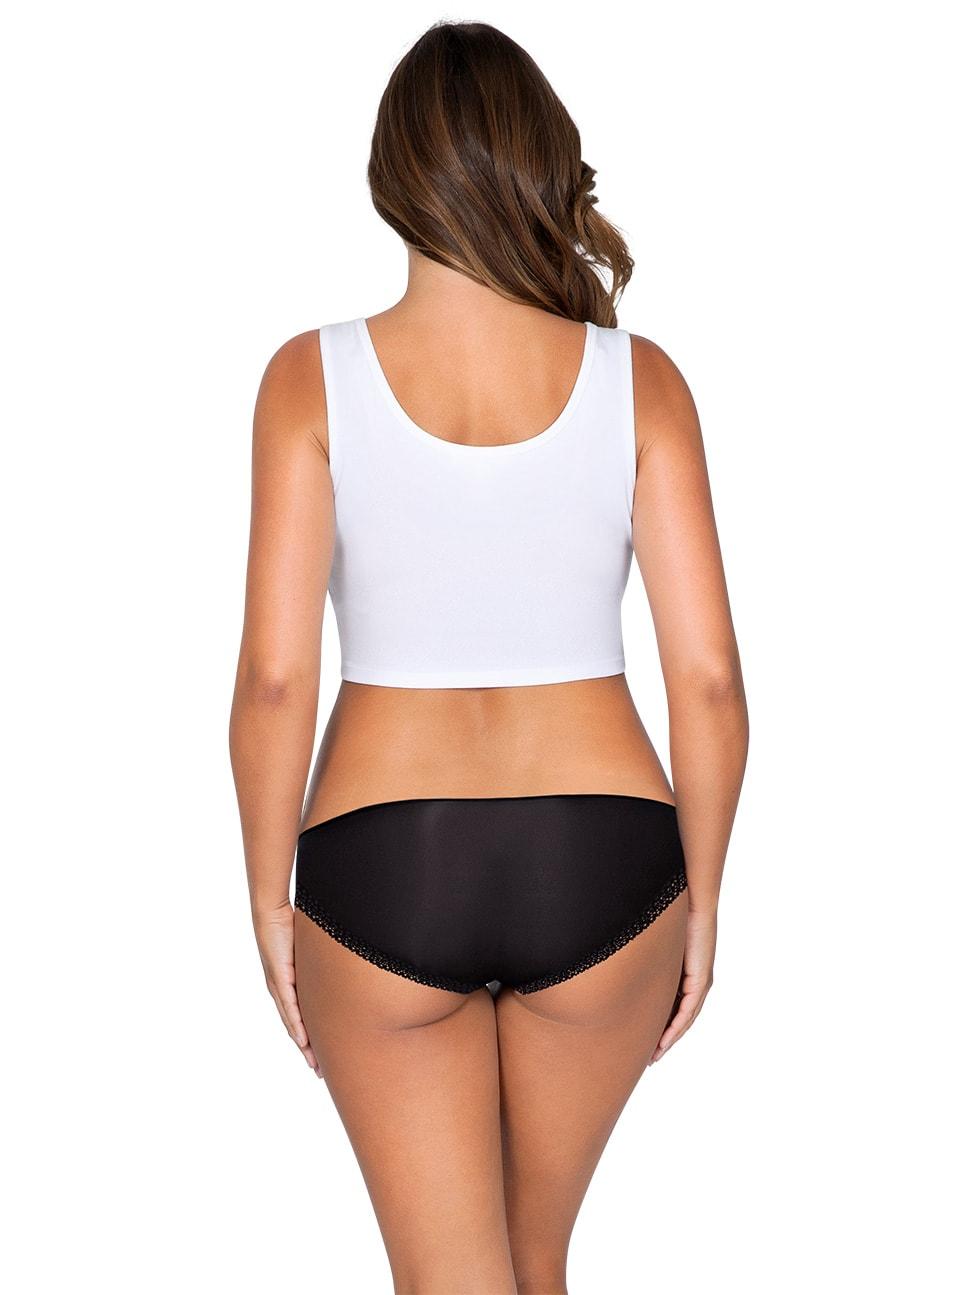 ParfaitPantyBikini PP301 A BlackBack - Panty So Lovely Bikini Black PP301